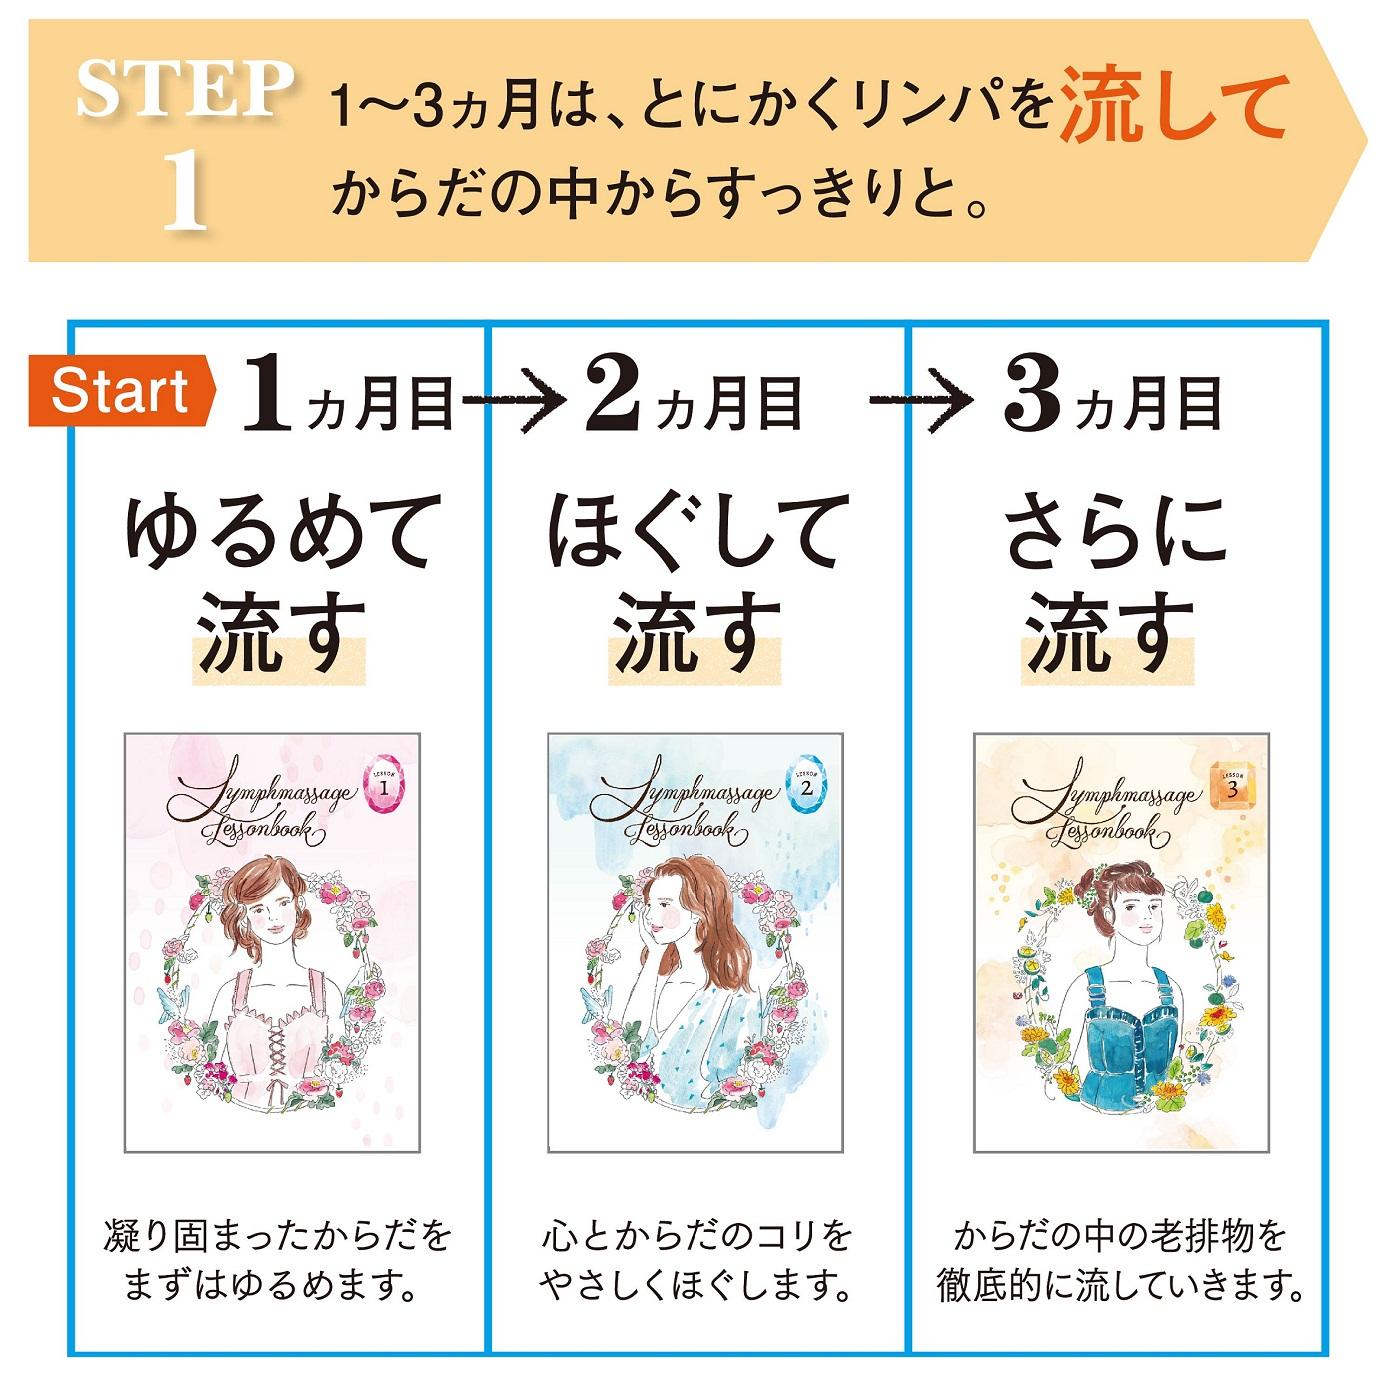 【STEP1】 リンパを流す3ヵ月。